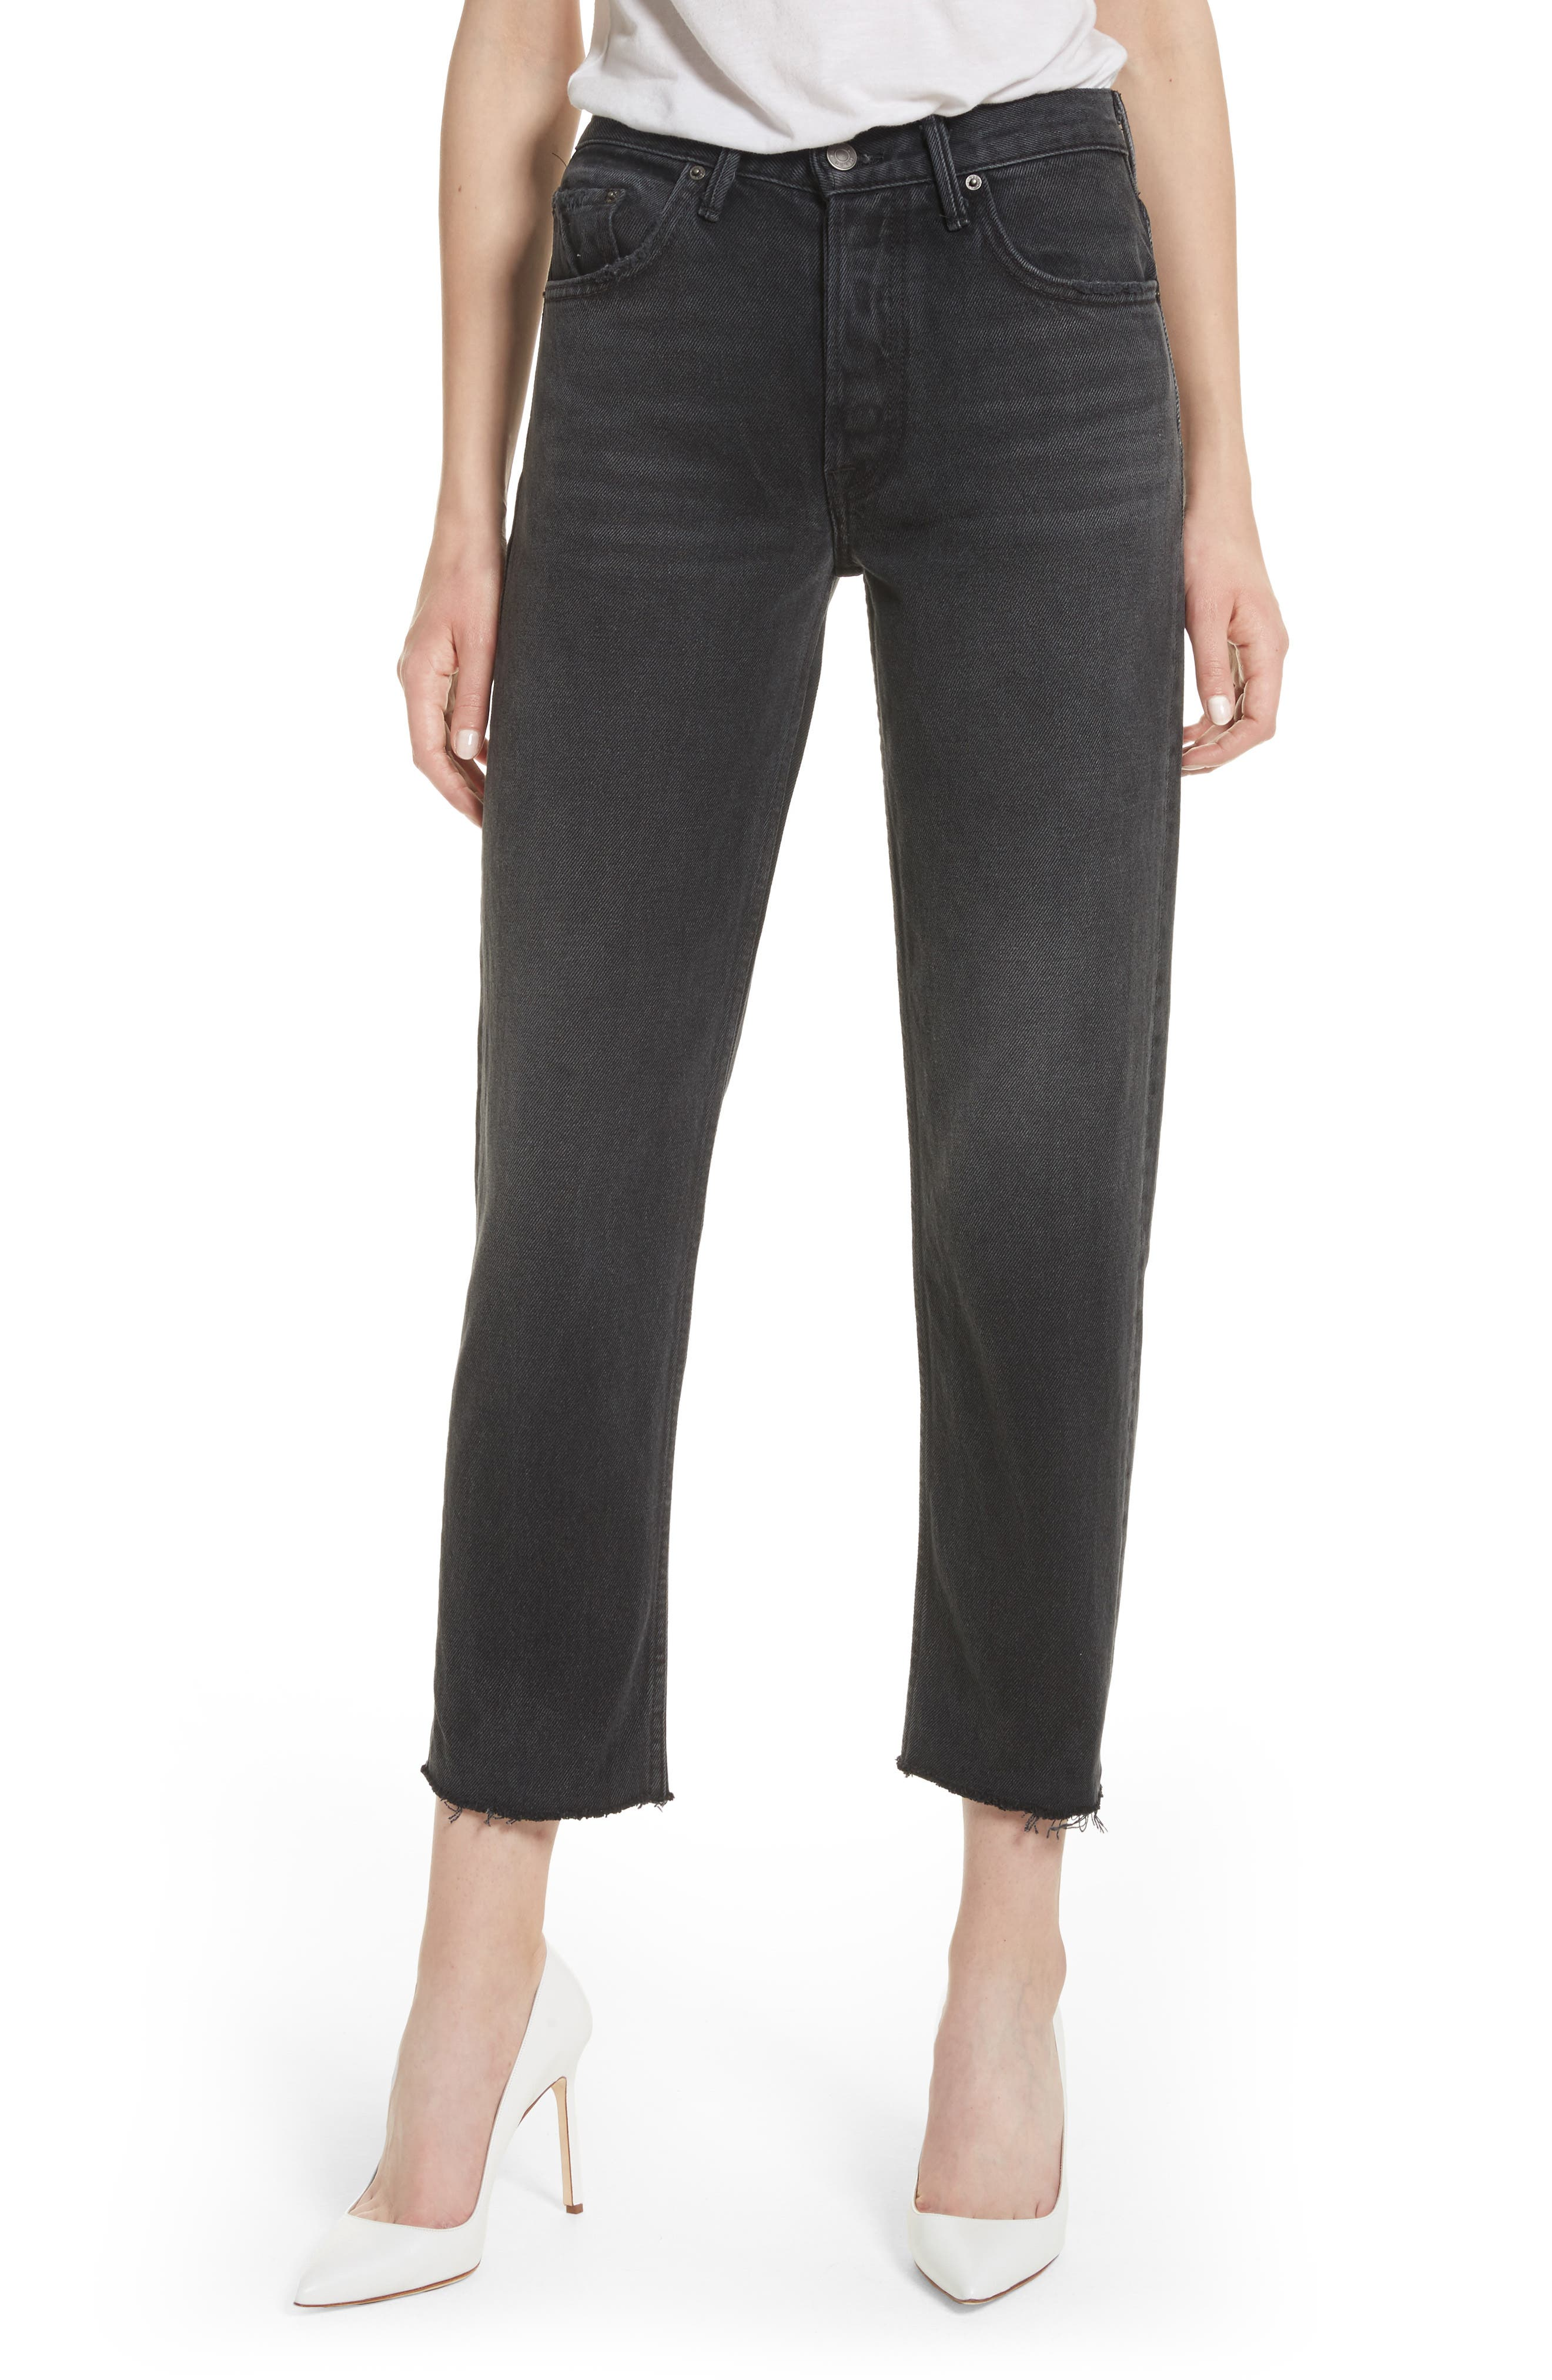 Alternate Image 1 Selected - GRLFRND Helena Rigid High Waist Straight Jeans (Proud Mary)